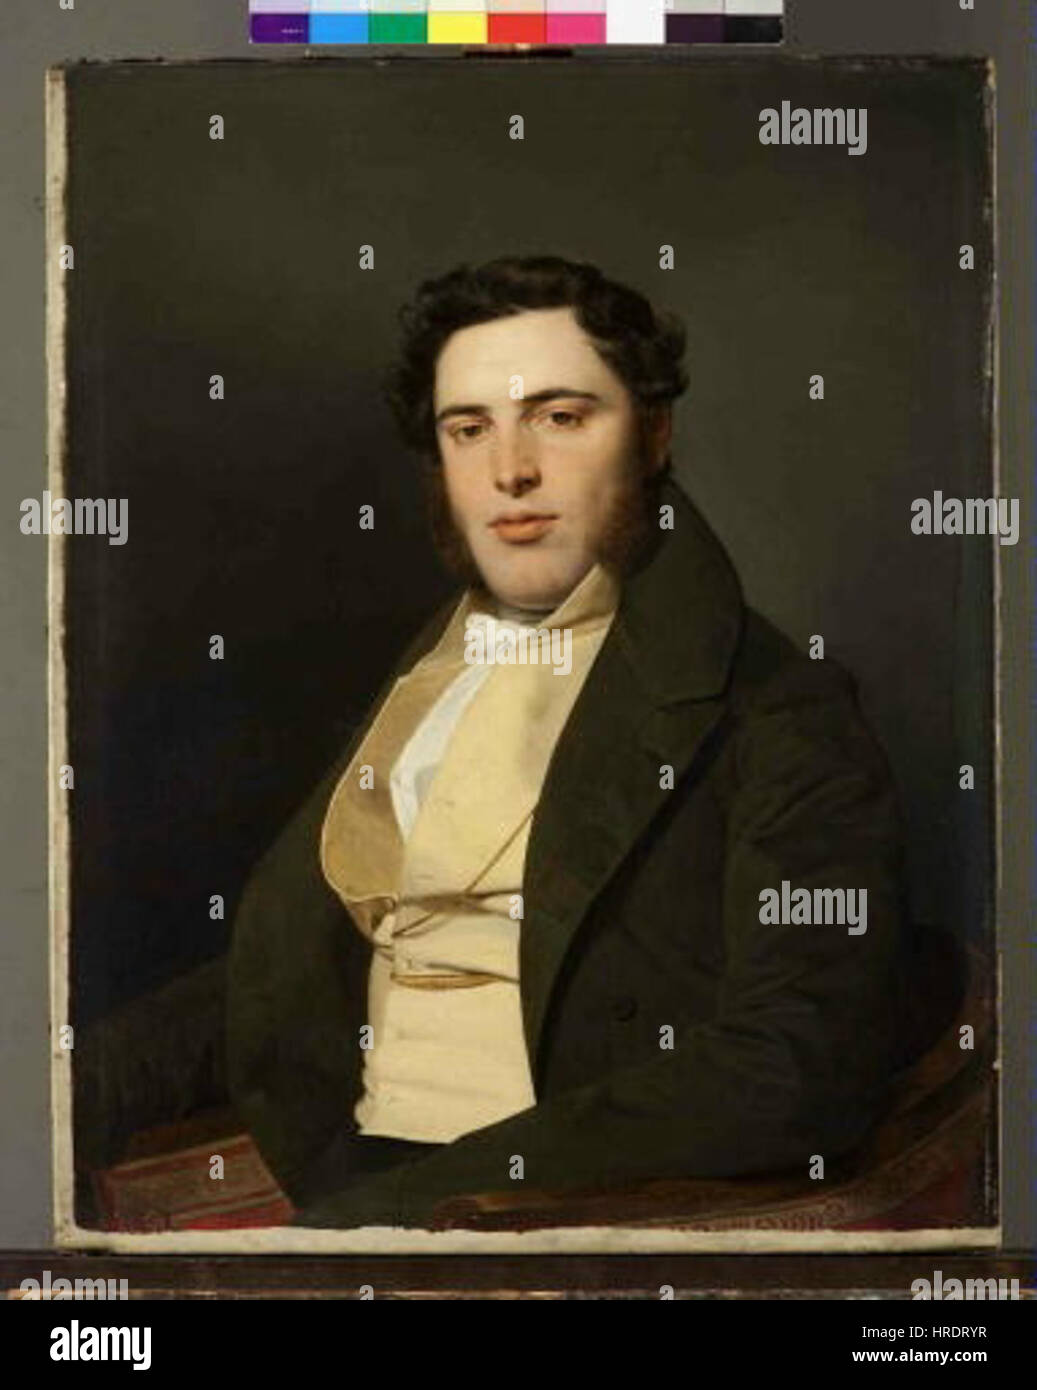 Ferdinand Georg Waldmuller 1793-1865 - Podobizna mladeho muze - Podobizna Matyase Josefa Vollgrubera - Stock Image